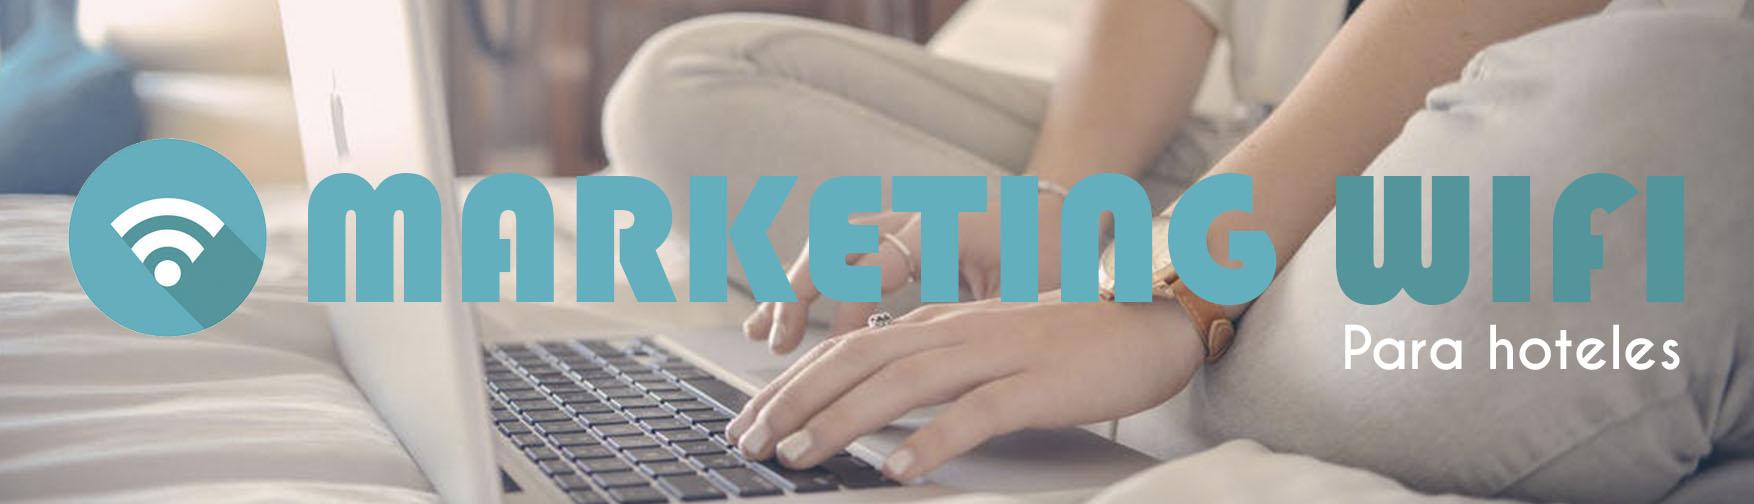 Marketing WIFI: la herramienta para Hoteles imprescindible